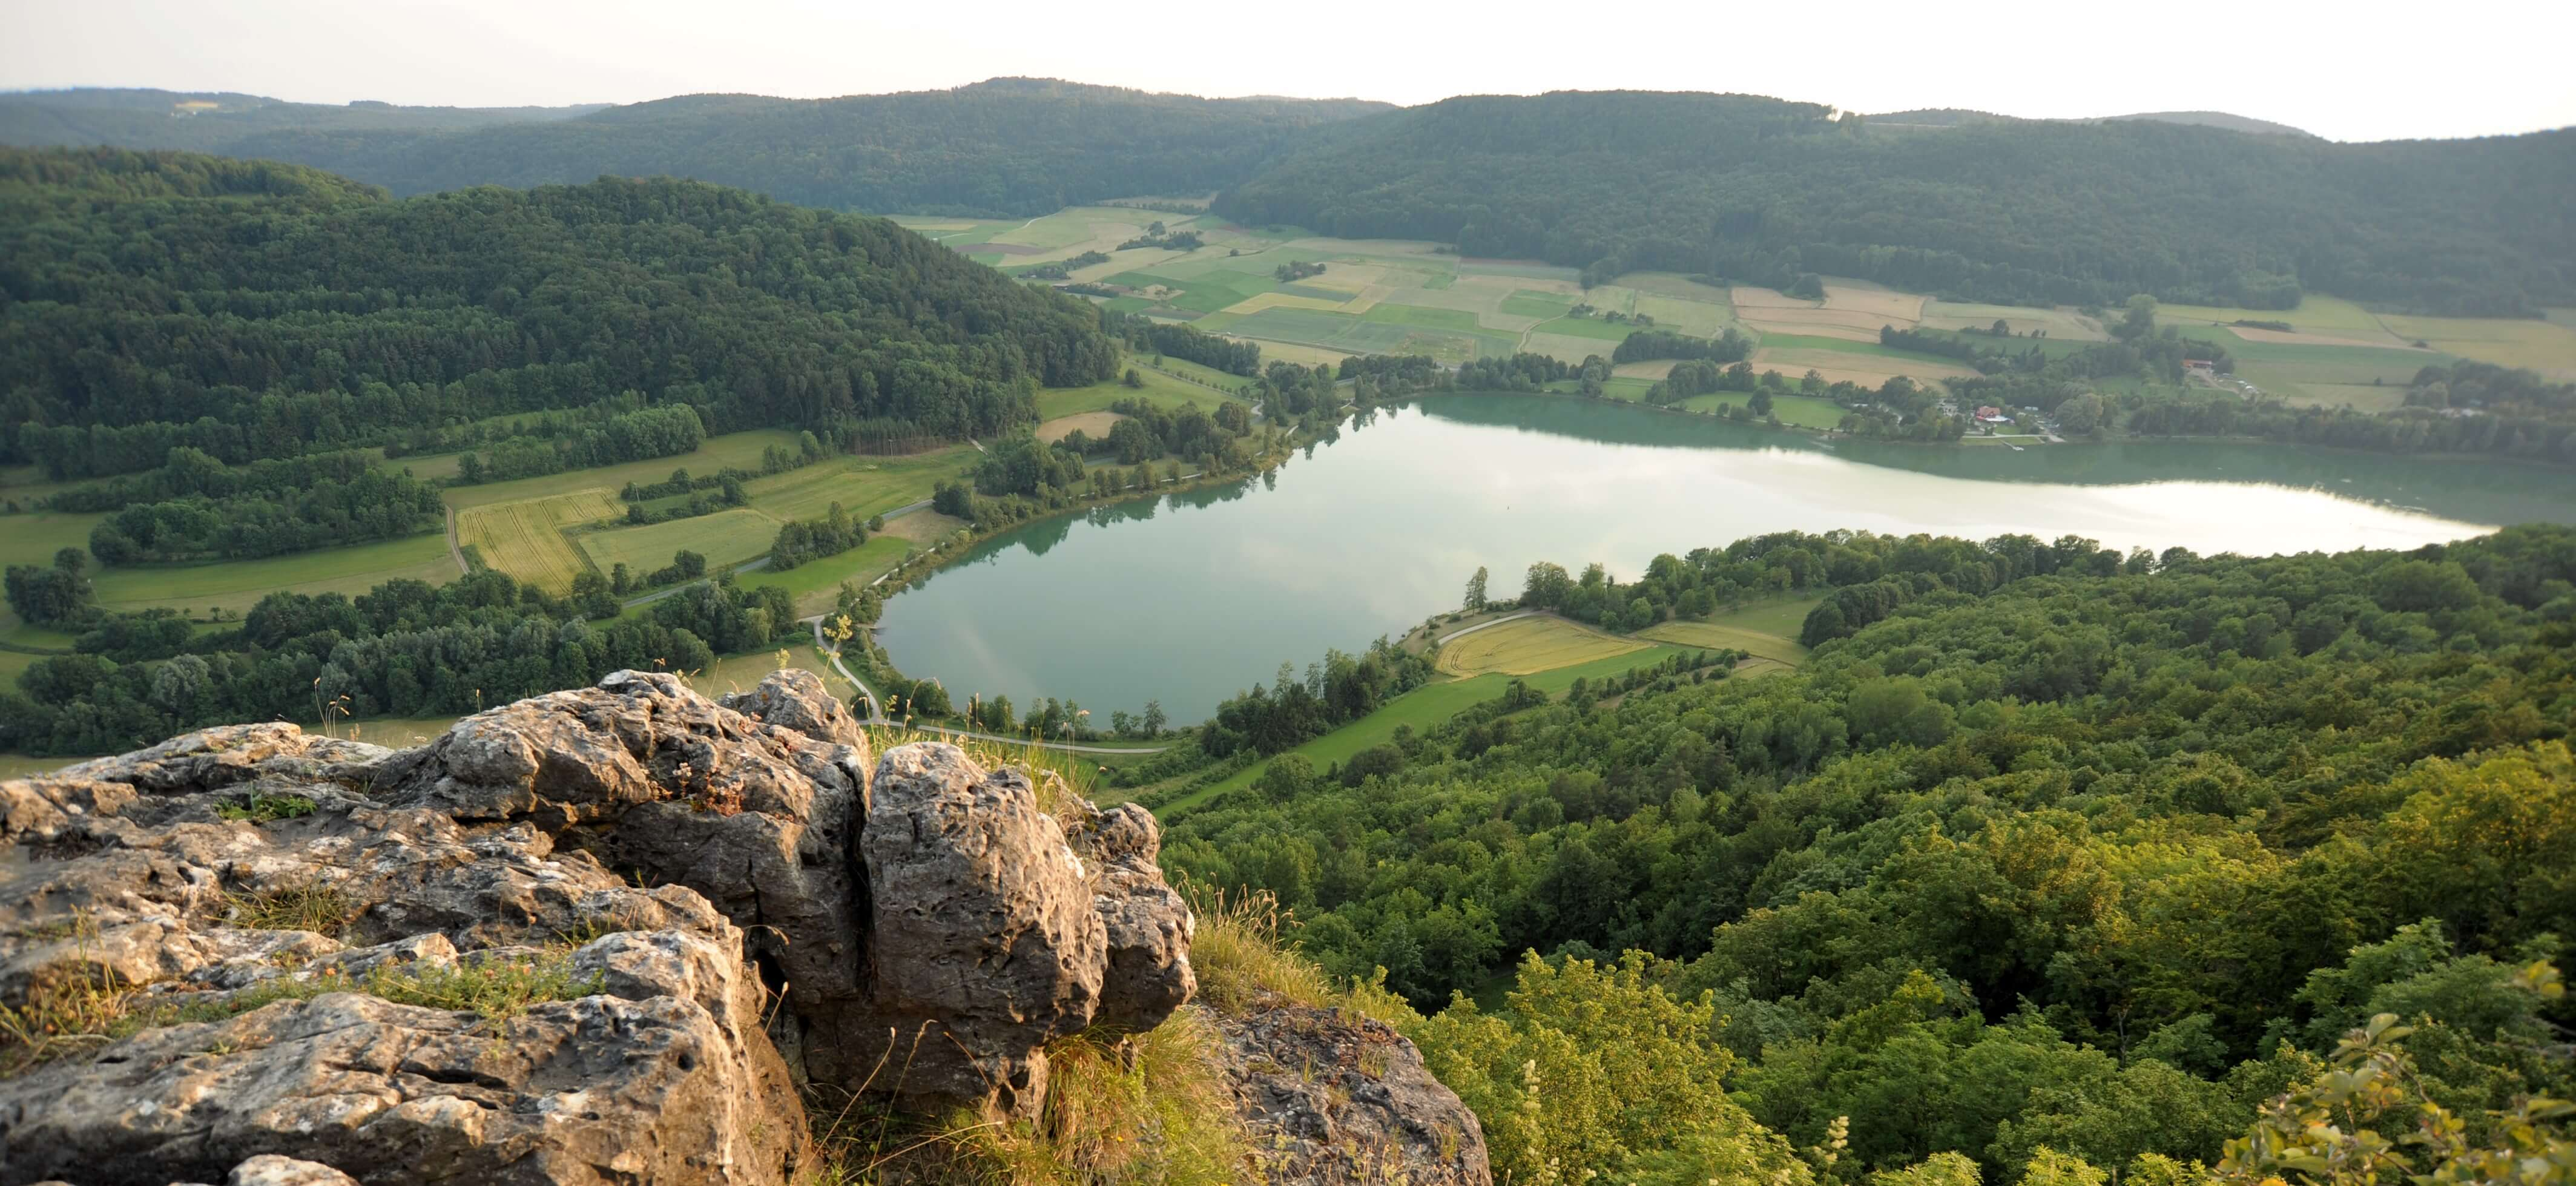 Happurger See im Frankenland